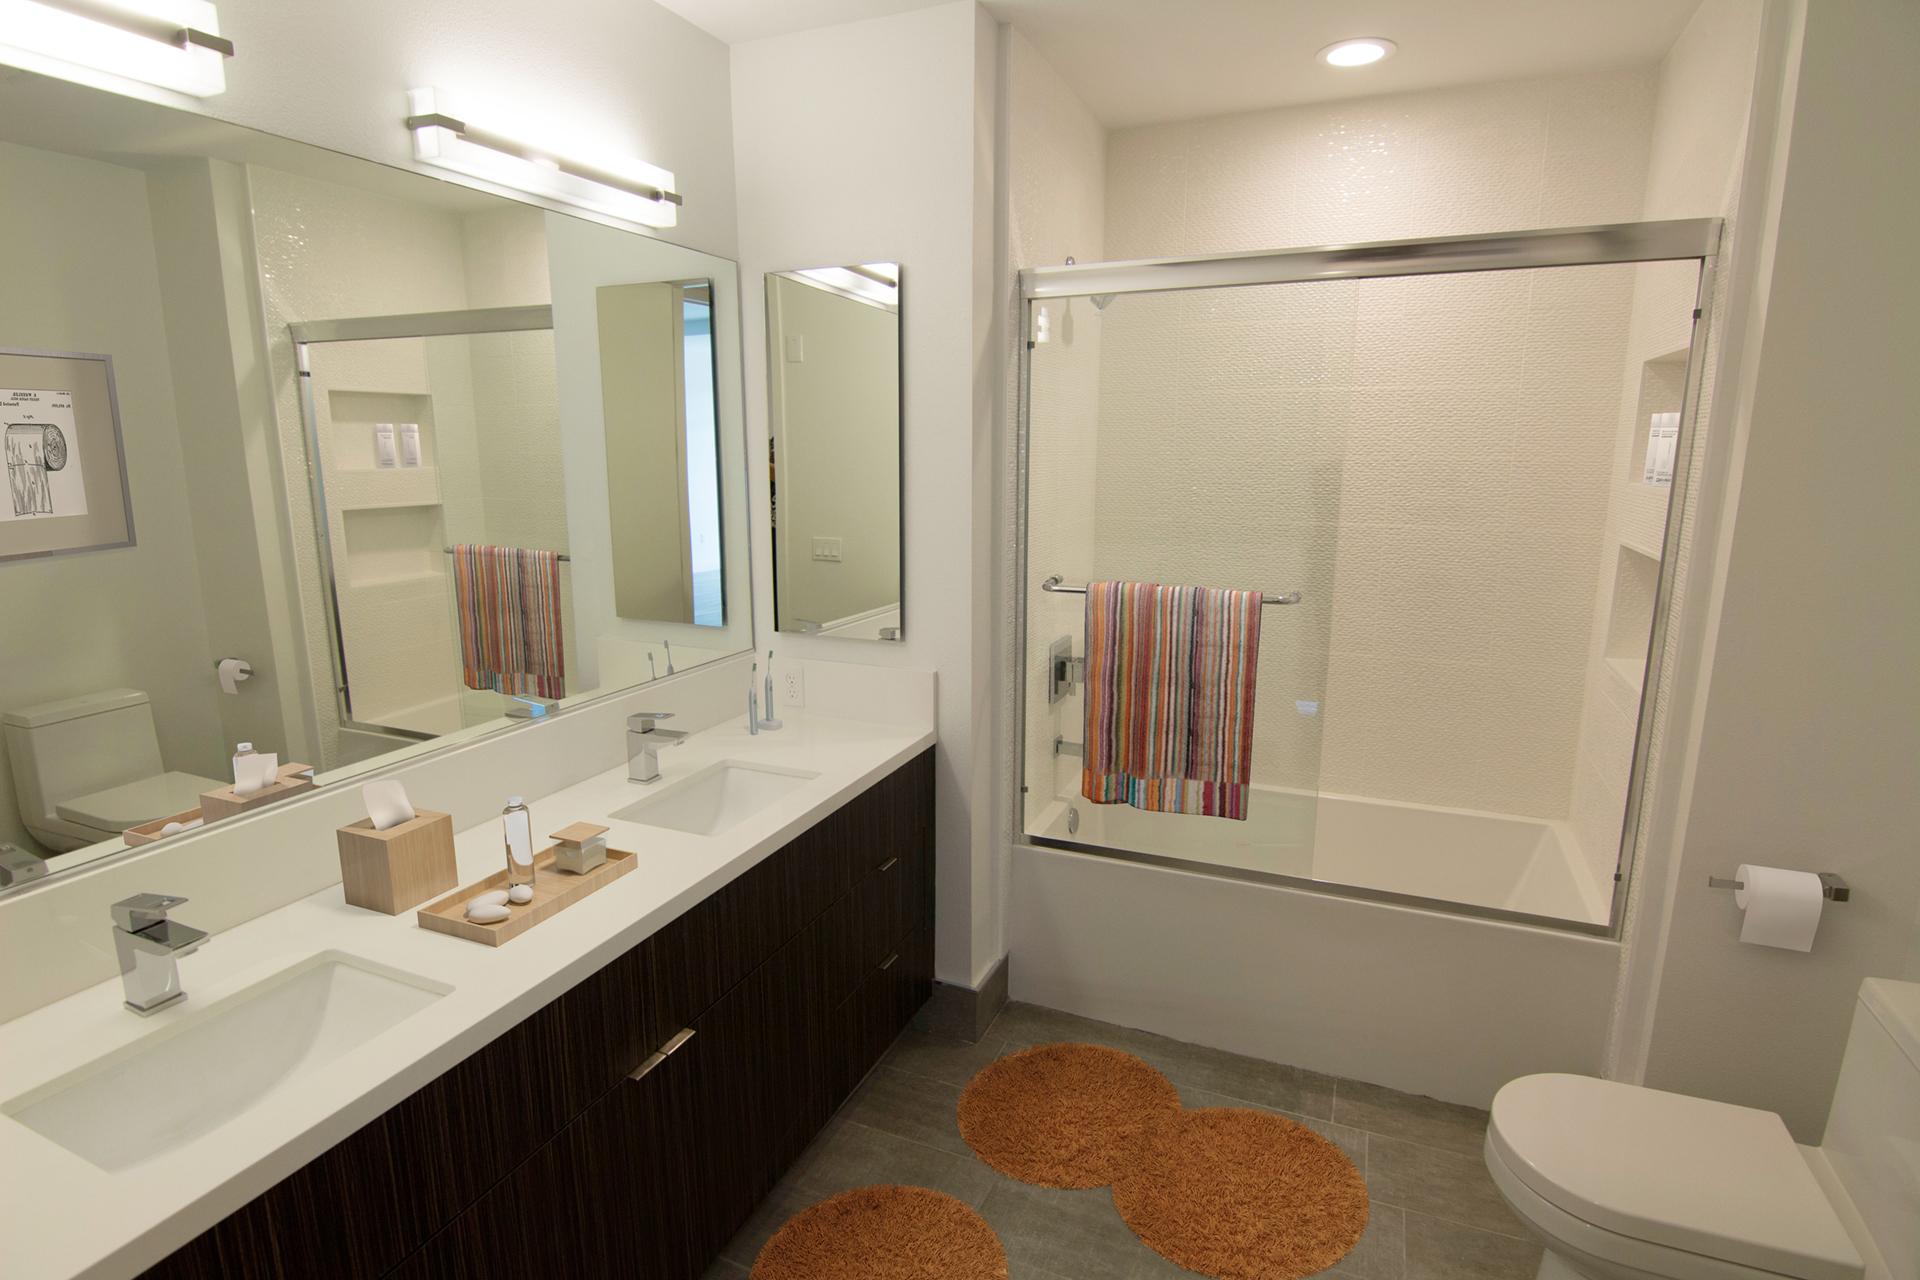 High End Apartments in Westwood, Los Angeles for Rent - Gayley & Lindbrook Bathroom